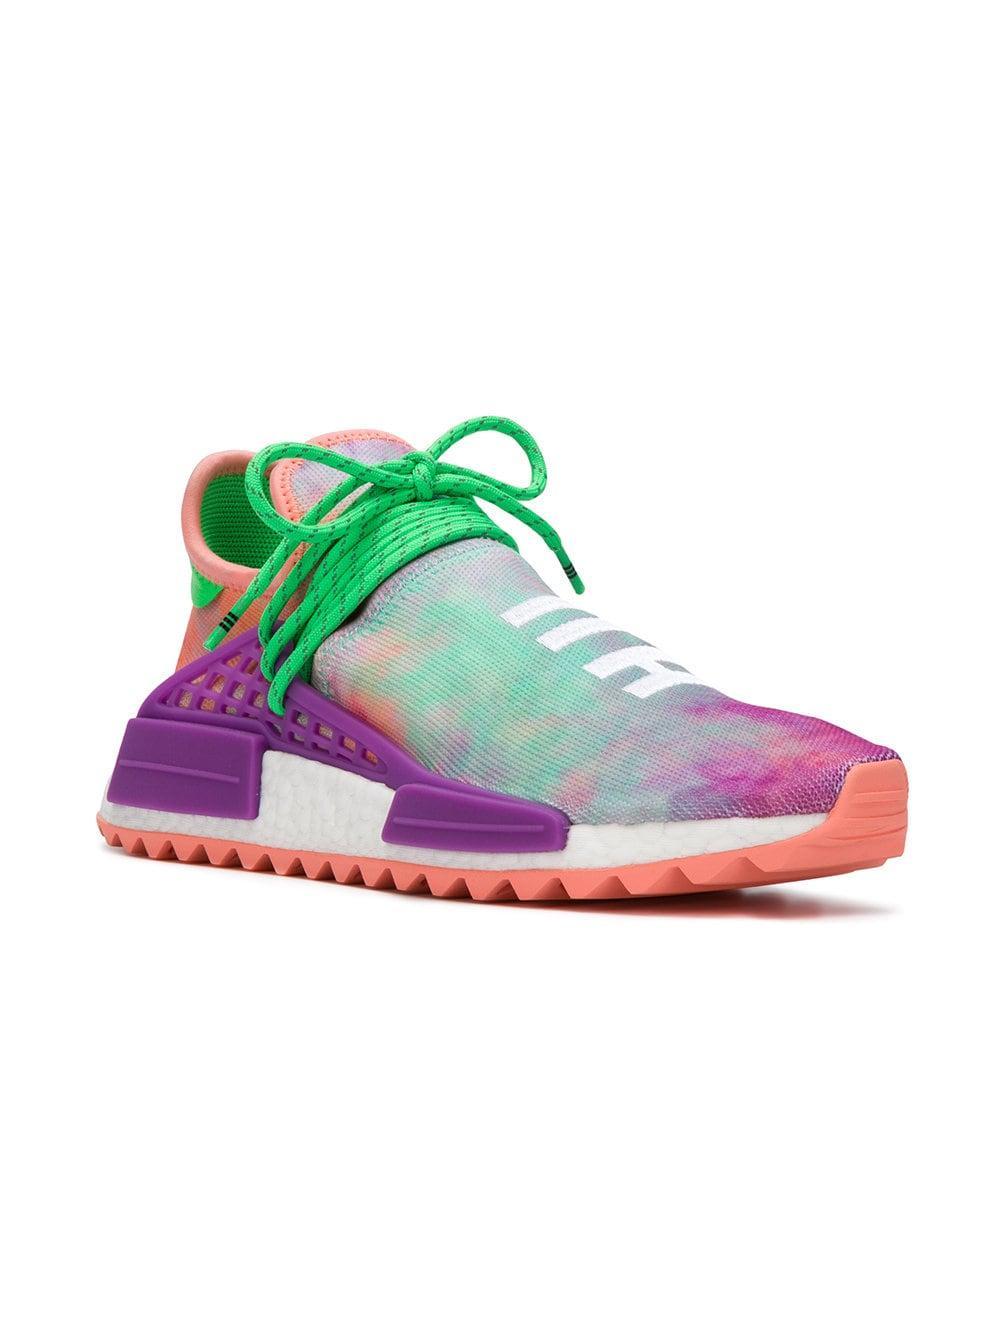 af265d2a049b2 adidas Tie-dye Holi Hu Nmd Sneakers for Men - Lyst